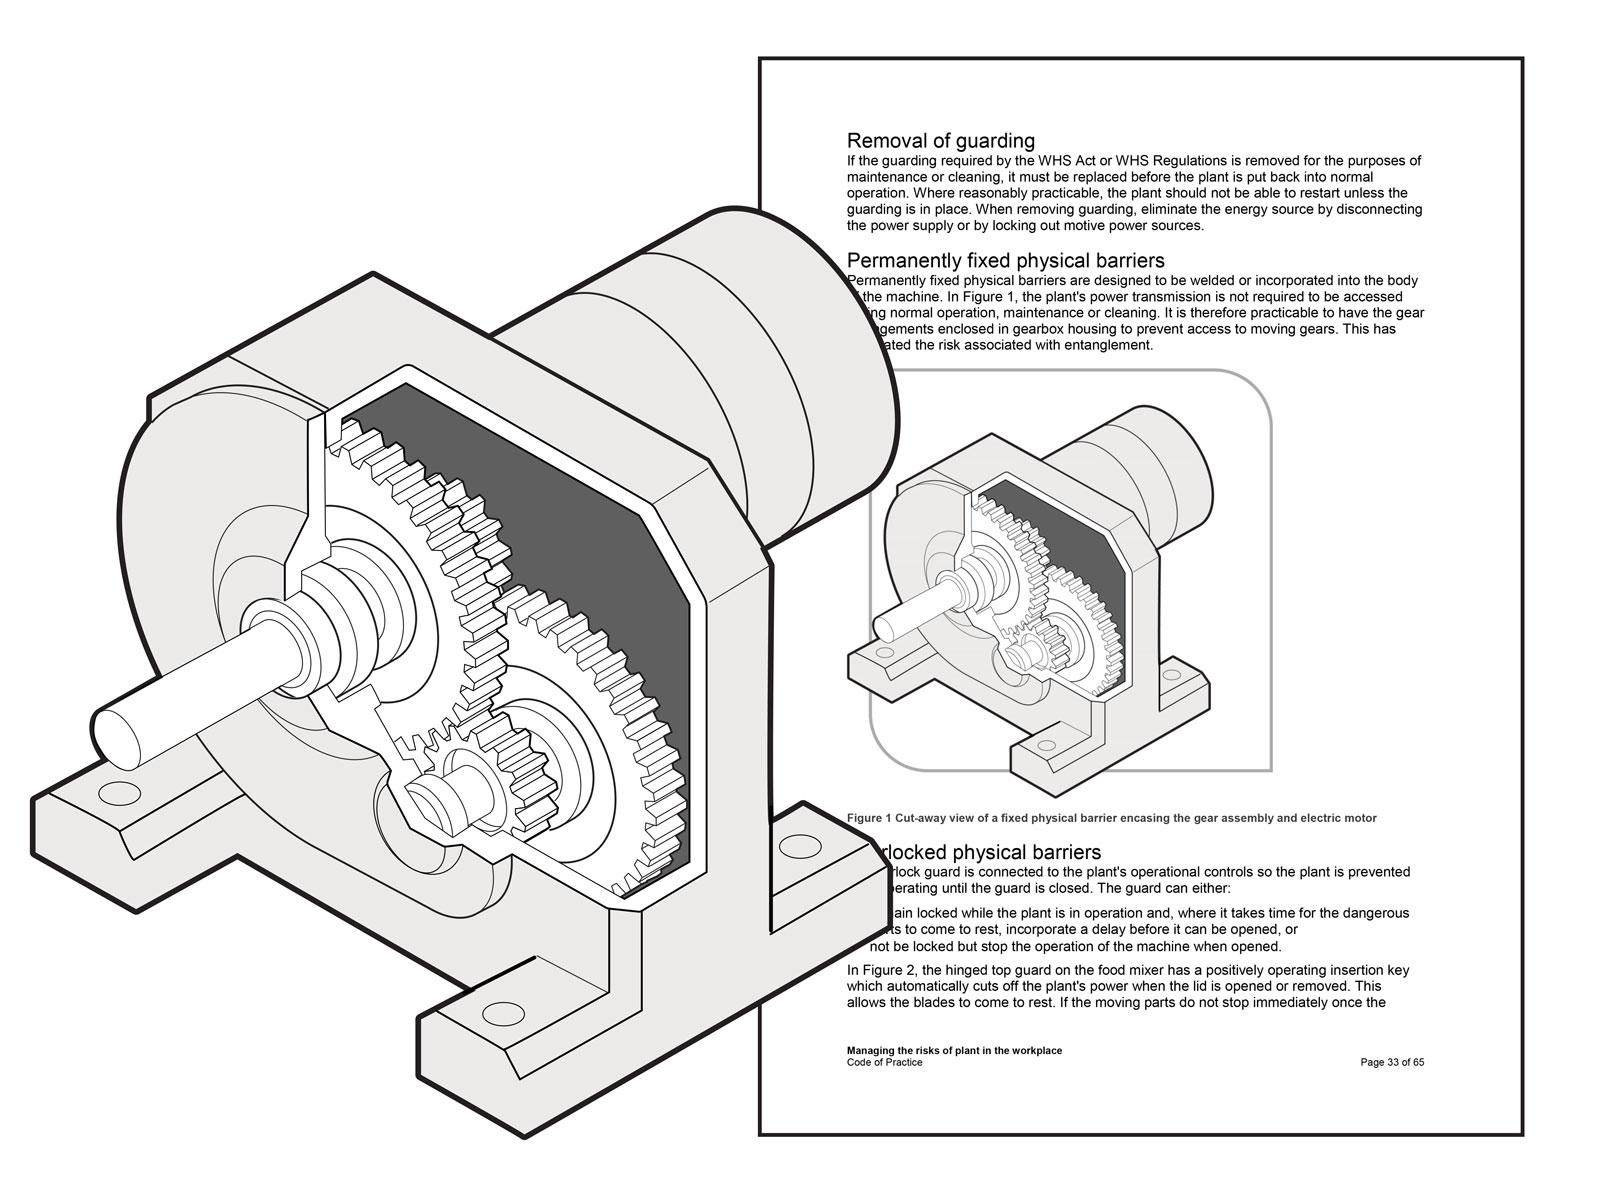 Cutaway of a fixed barrier encasing a gear assembly